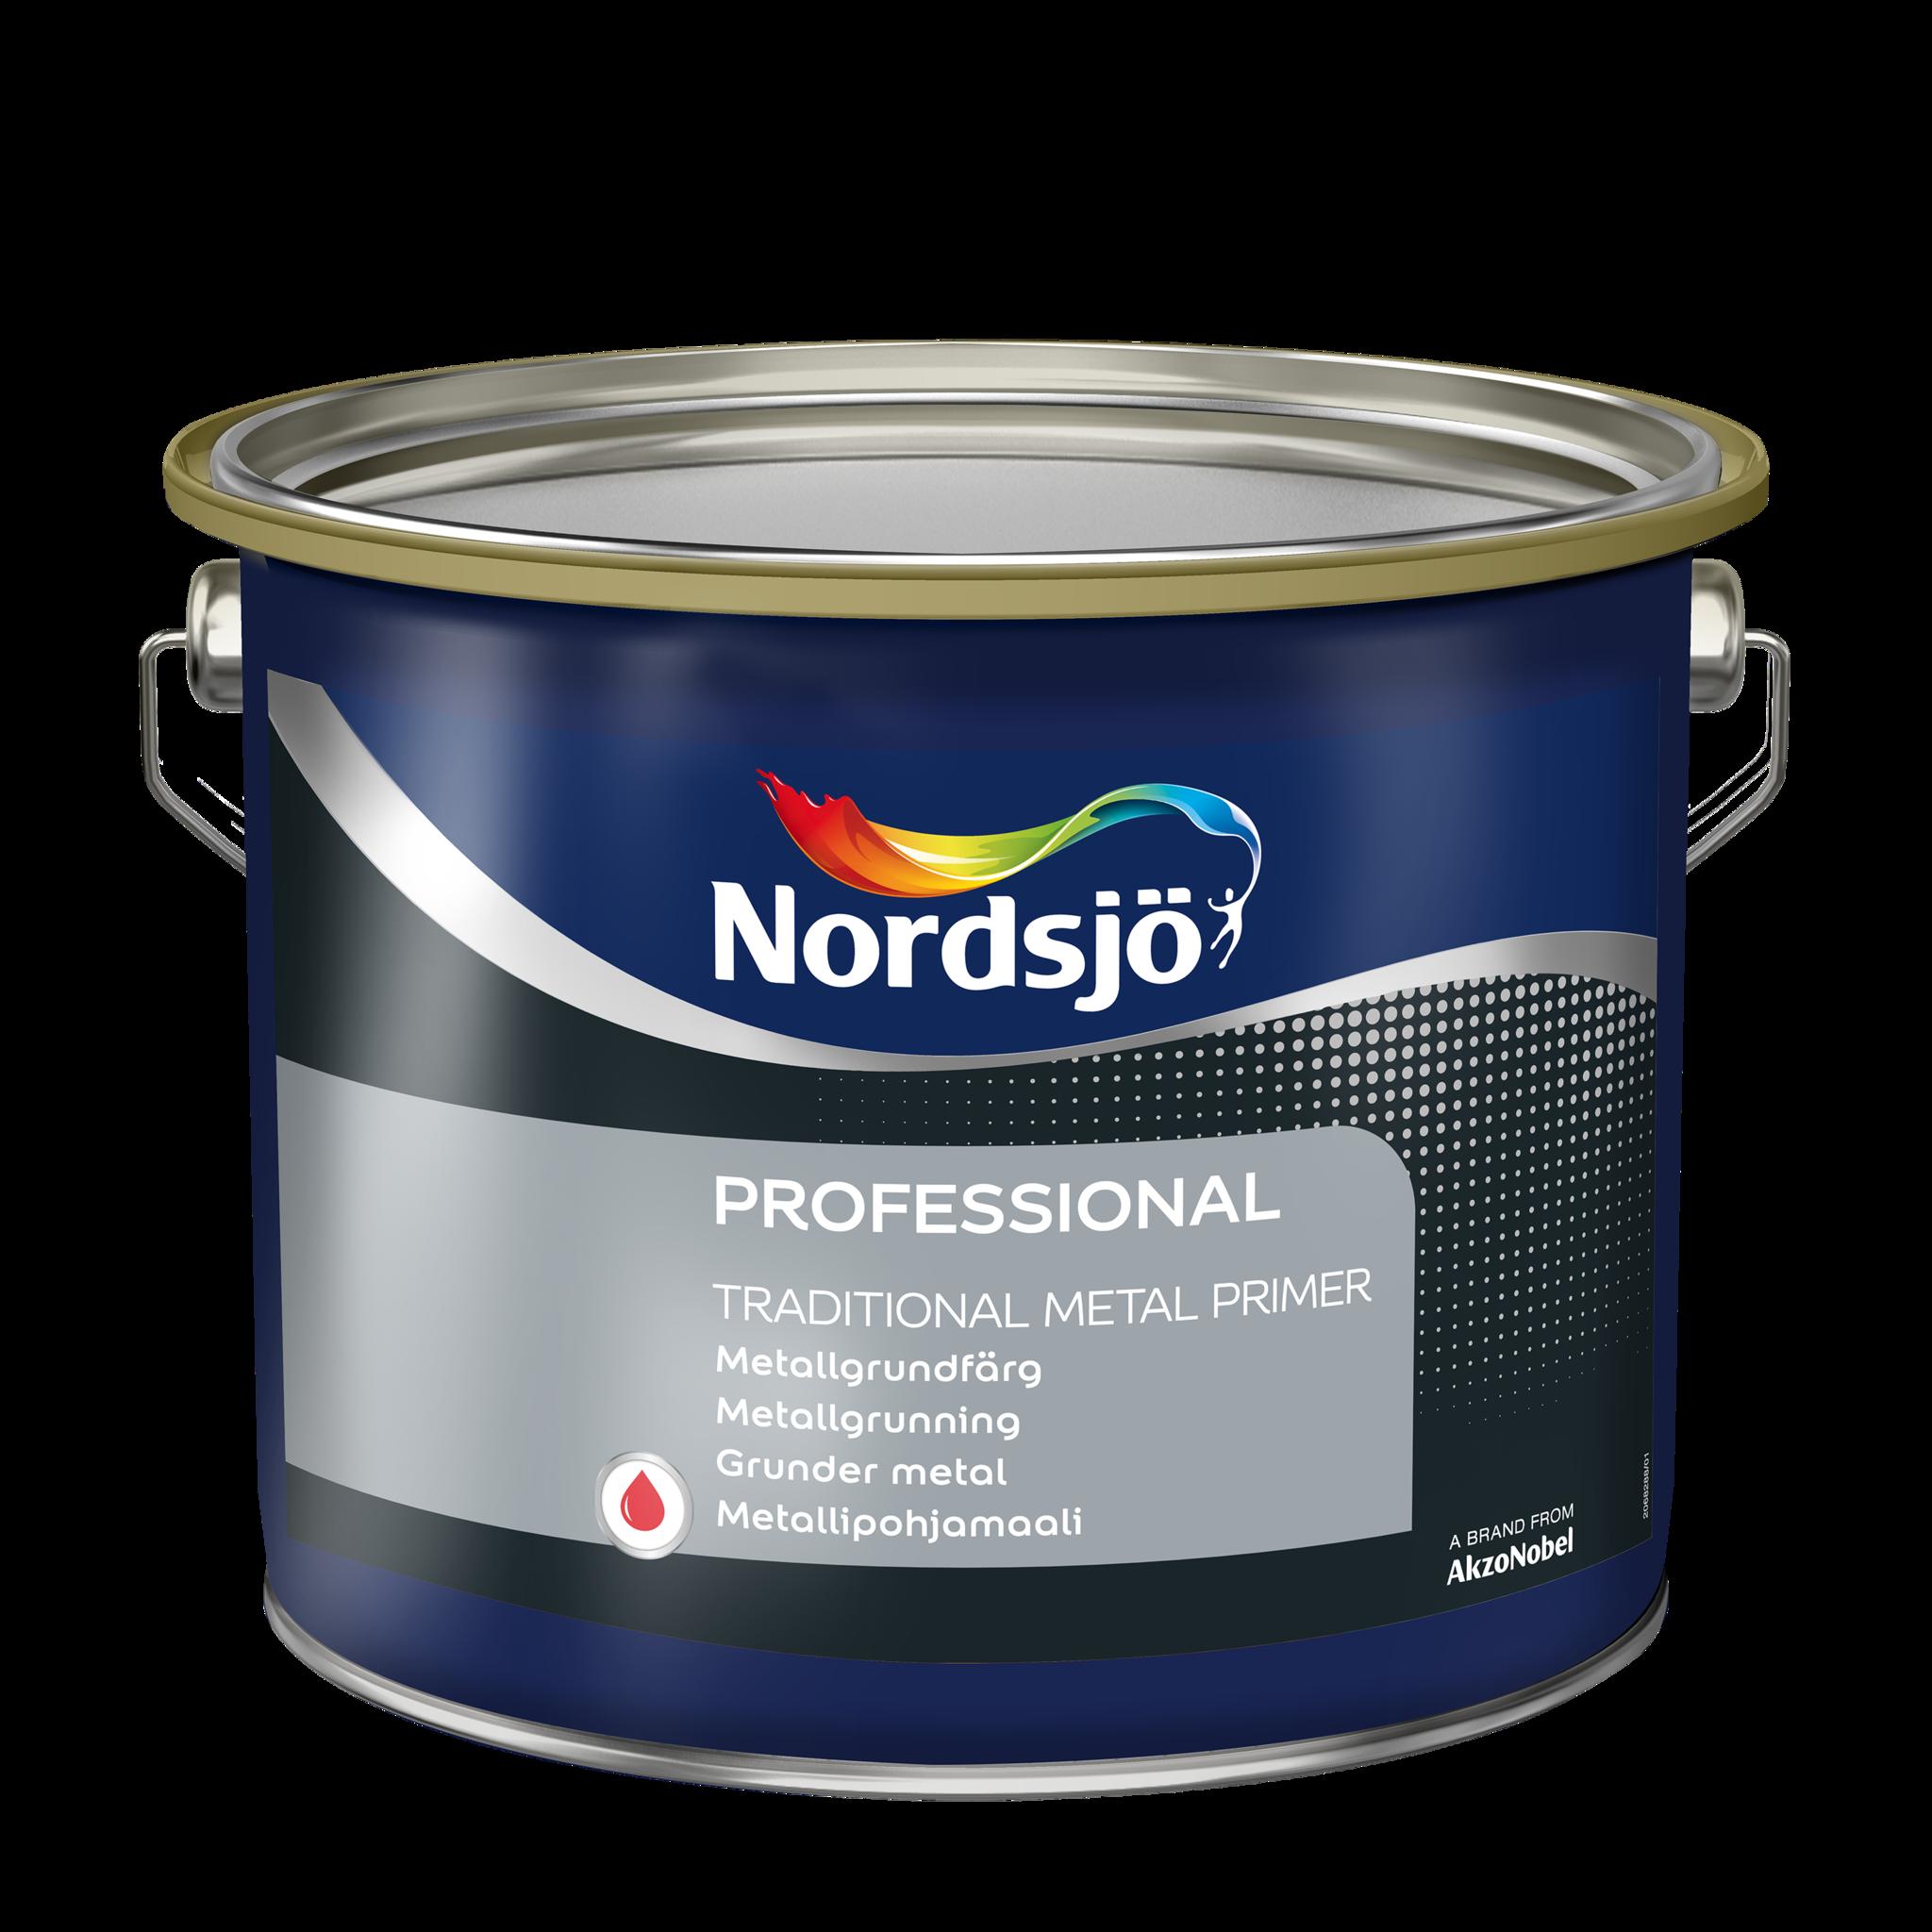 Nordsjö Professional Traditional Metal Primer